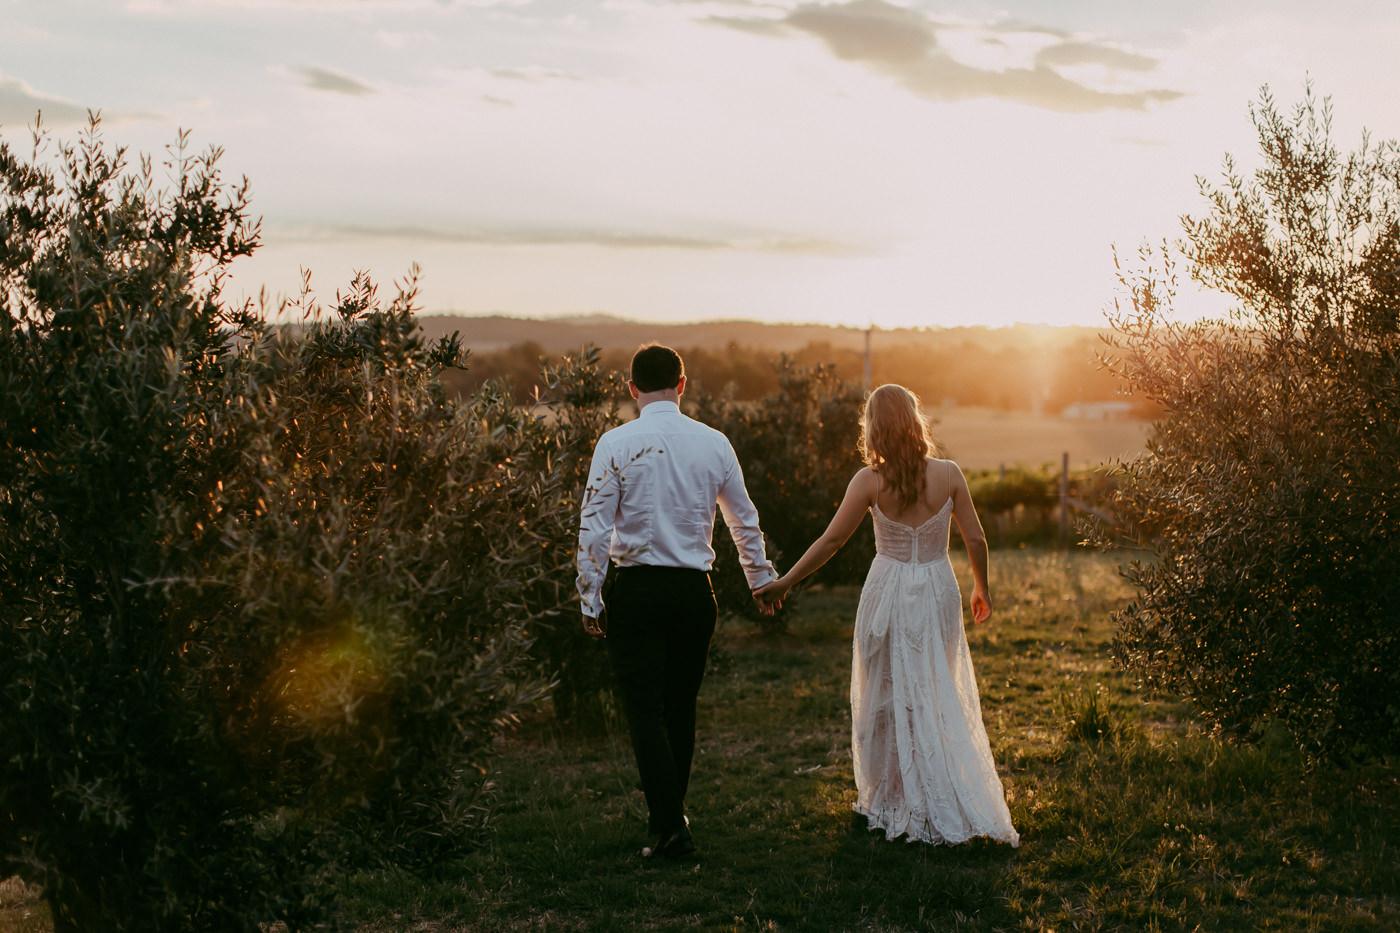 Anthony & Eliet - Wagga Wagga Wedding - Country NSW - Samantha Heather Photography-149.jpg